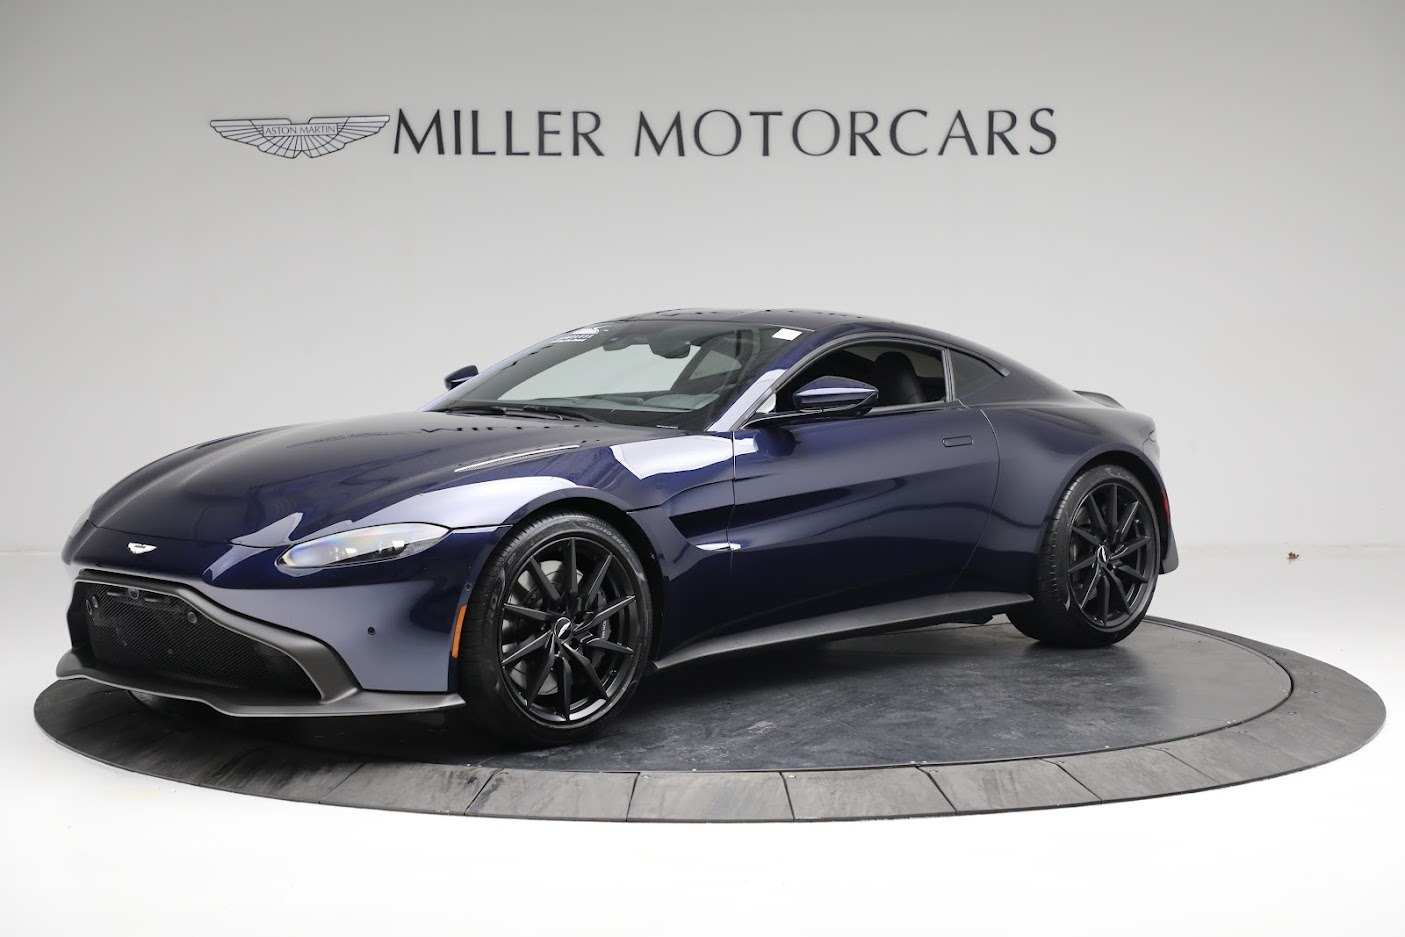 Used 2020 Aston Martin Vantage for sale $139,900 at Bugatti of Greenwich in Greenwich CT 06830 1